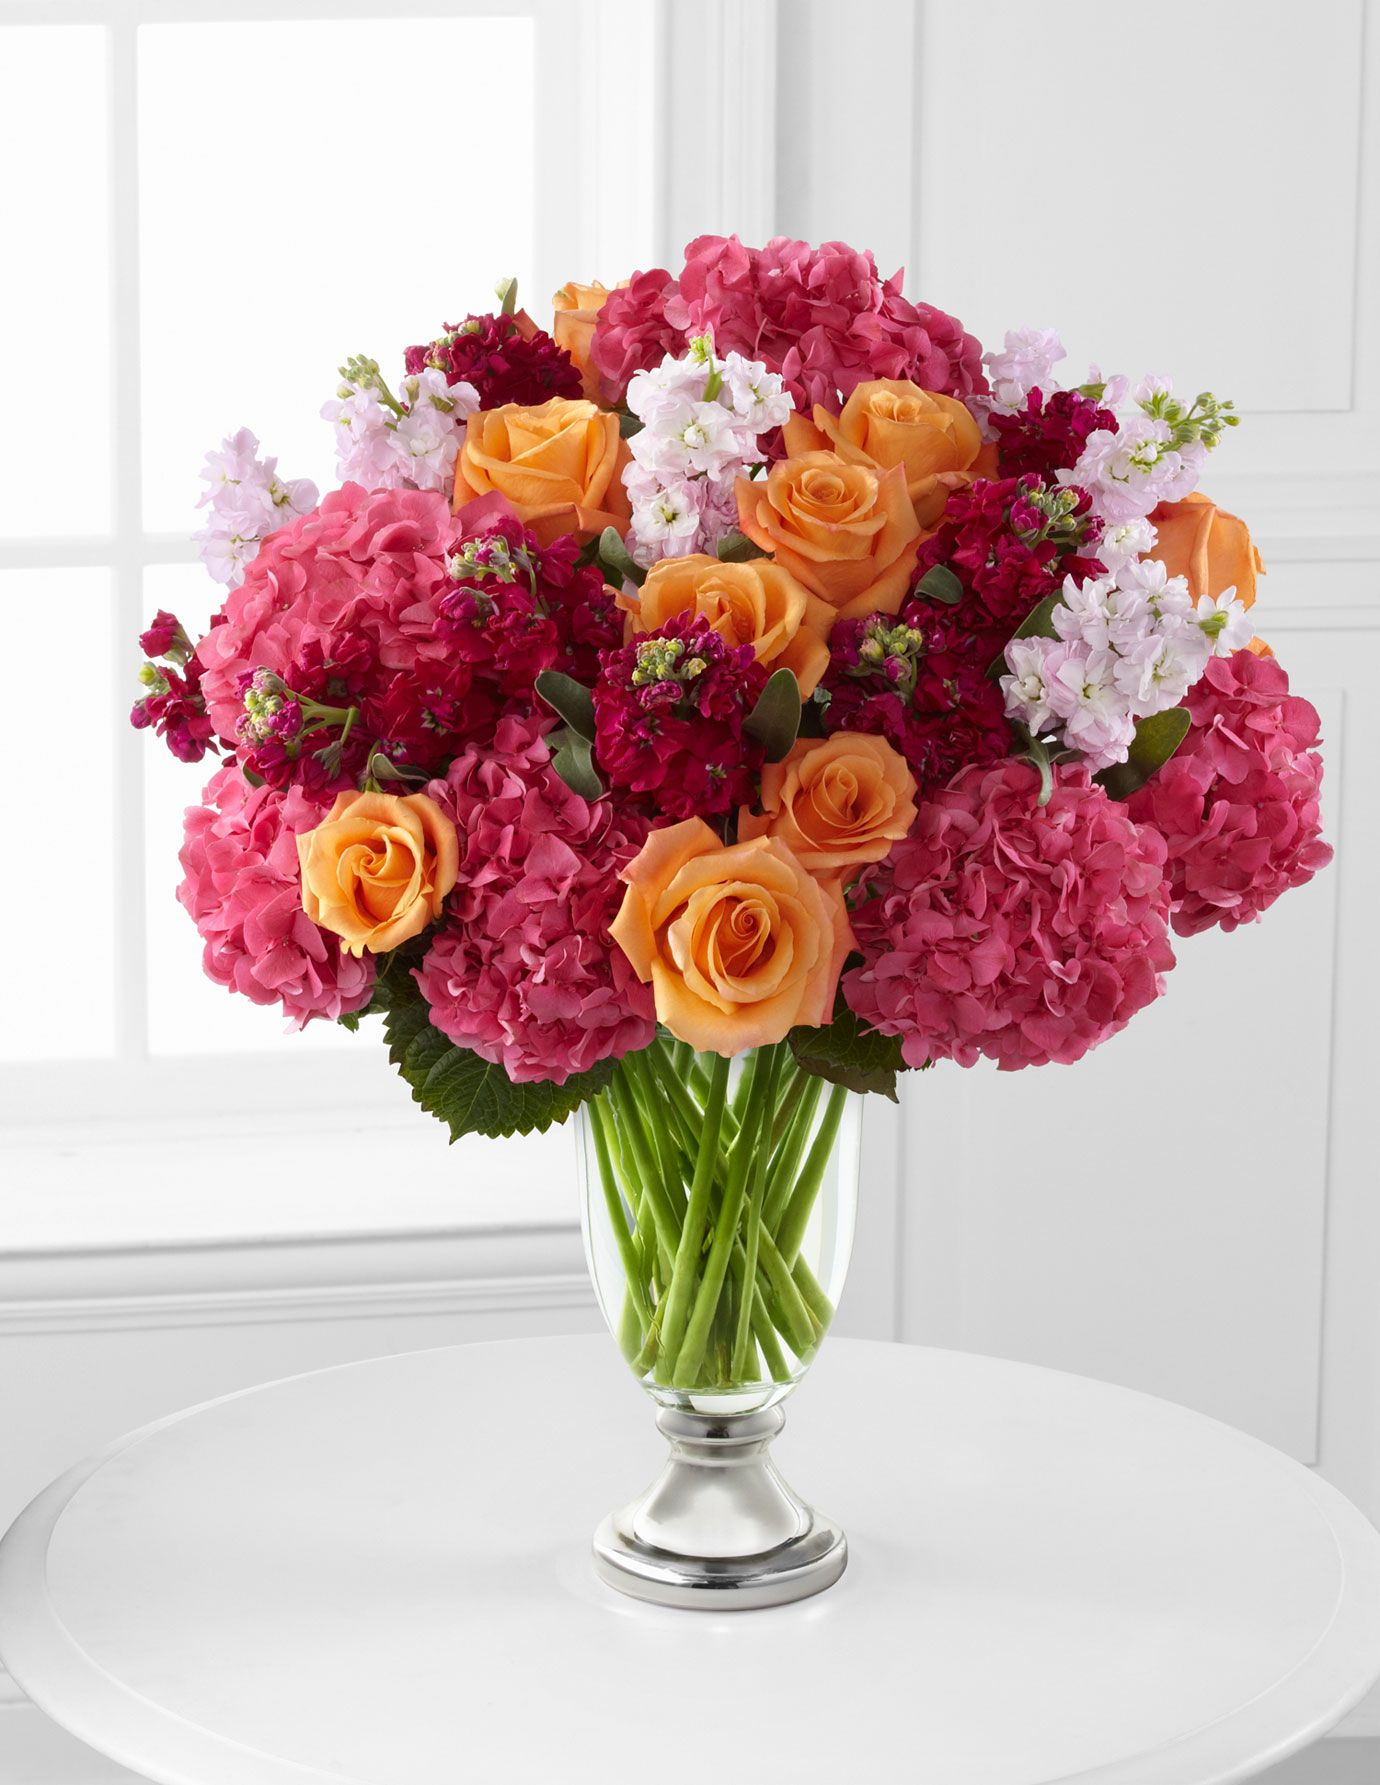 The 12 Best Valentine's Day Flower Arrangements for That